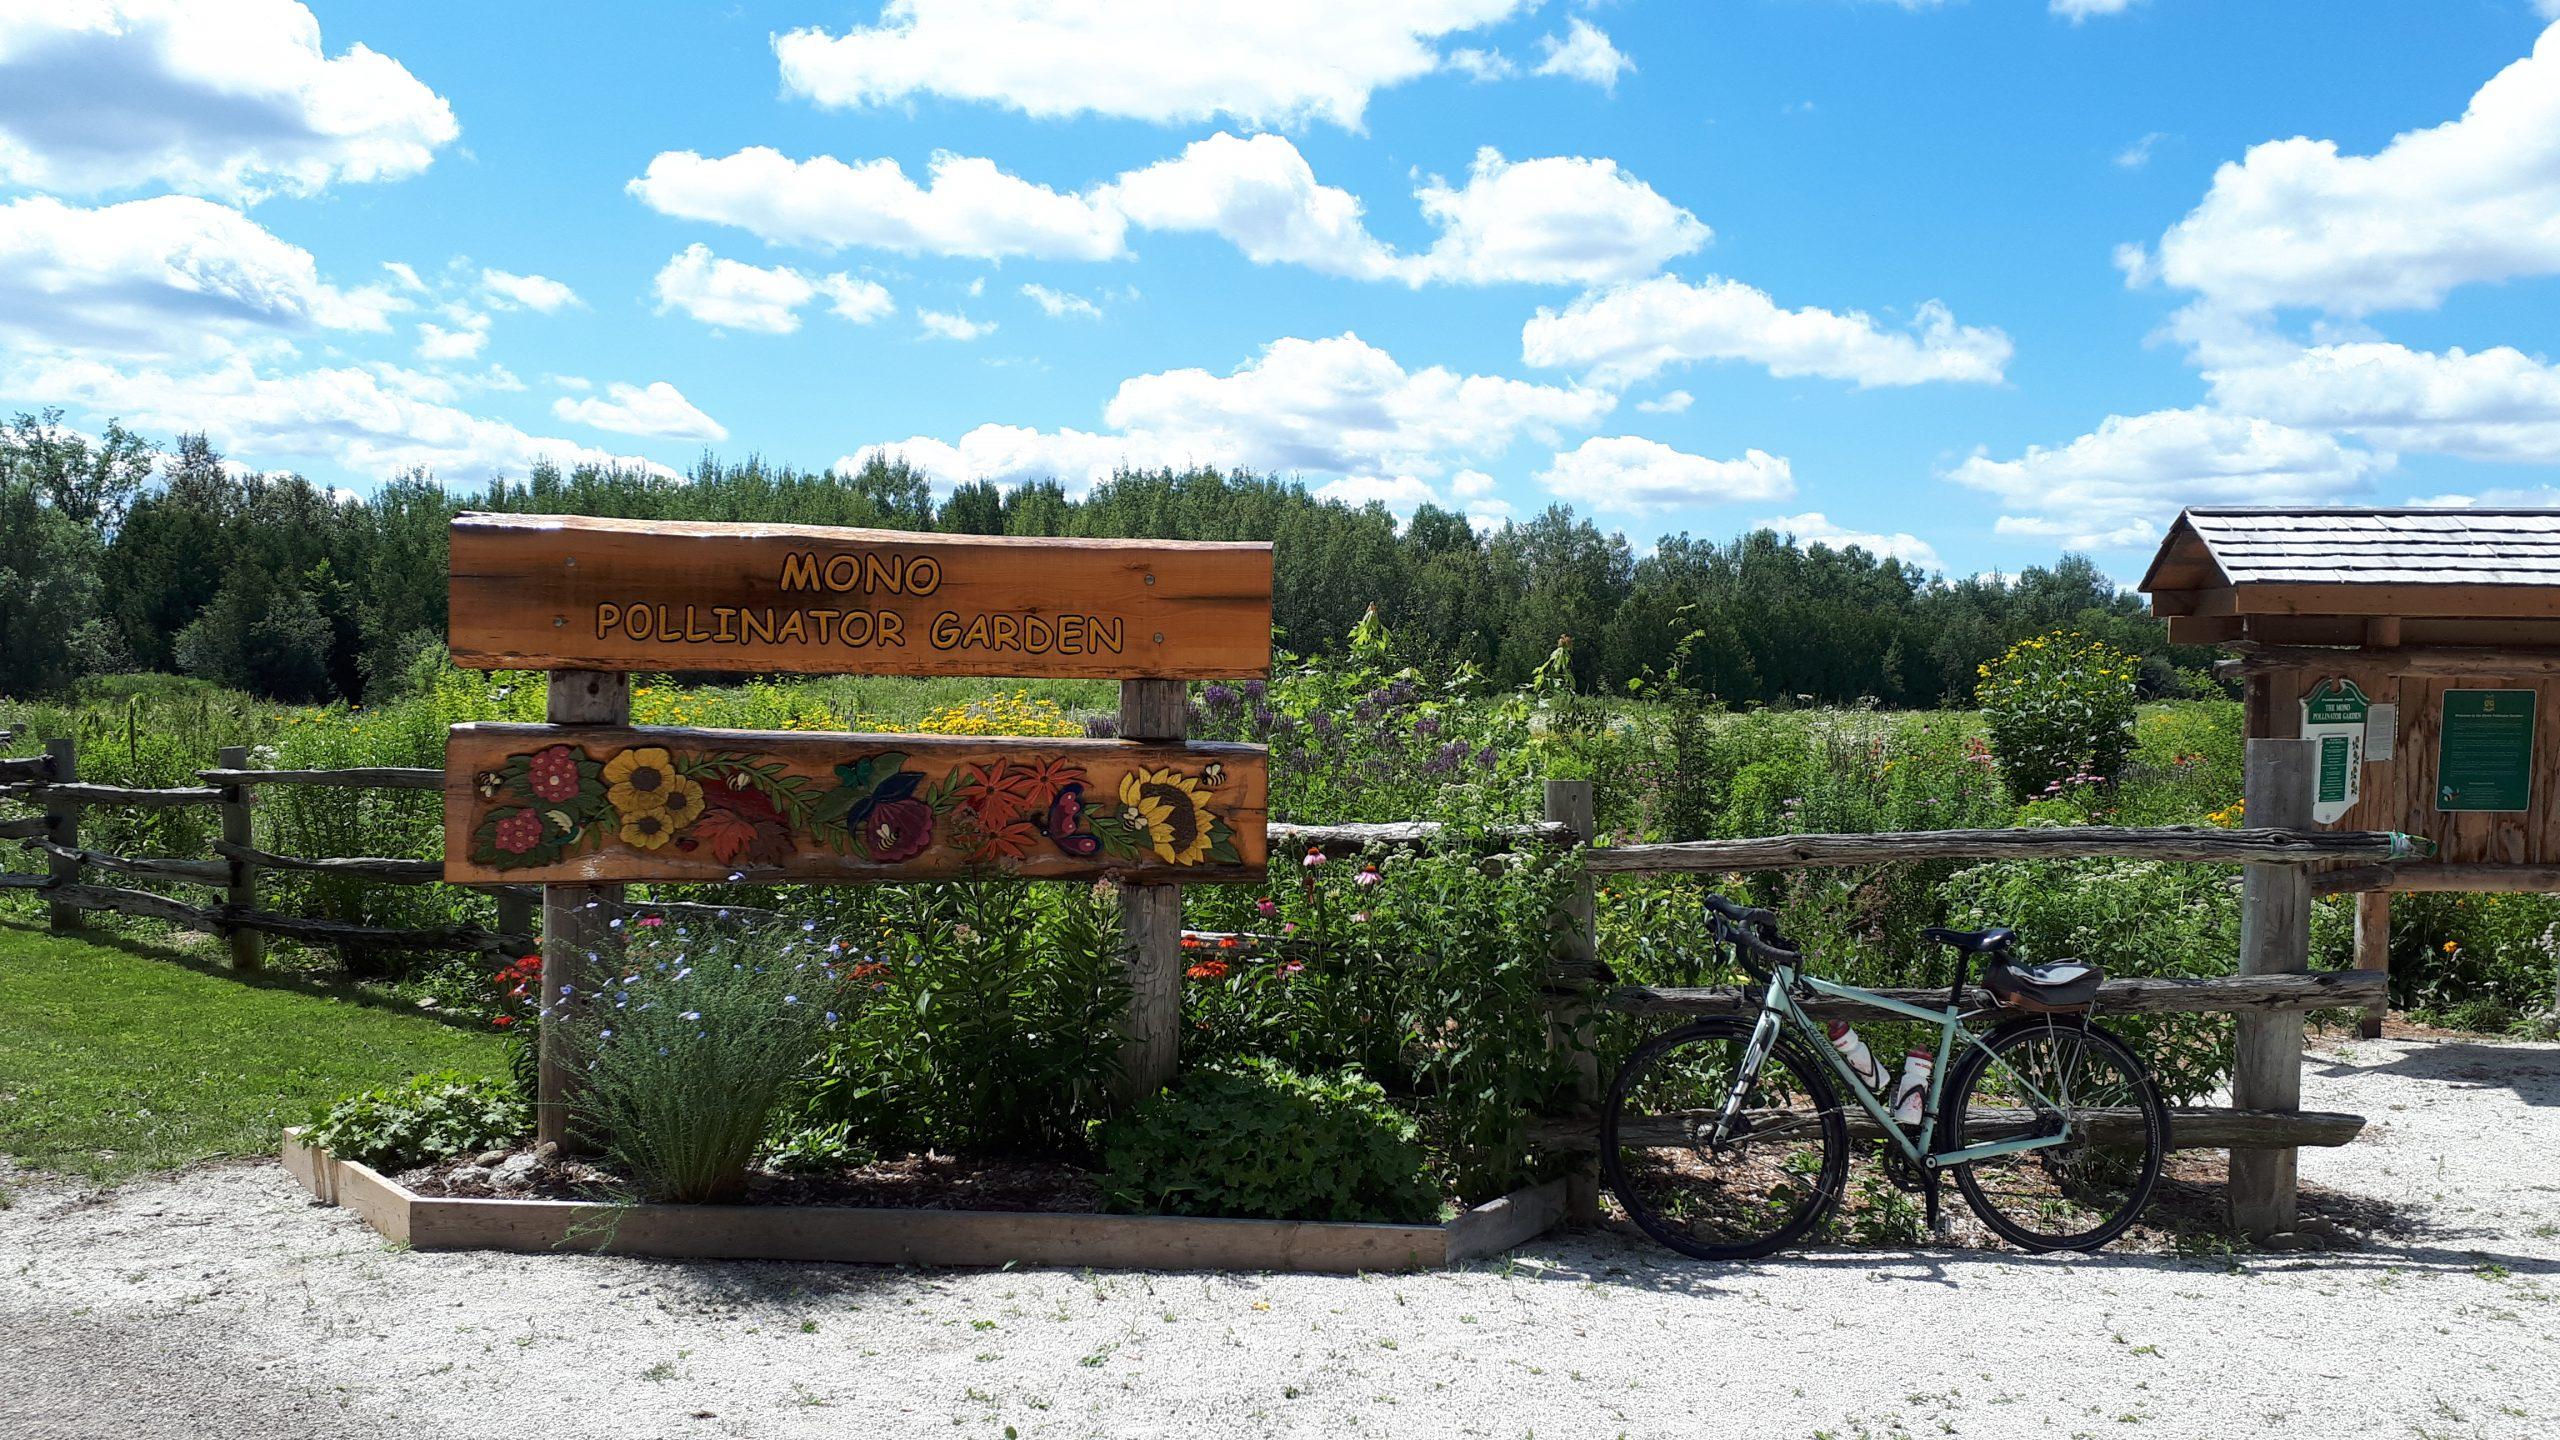 Mono Pollinator Gardens near Orangeville